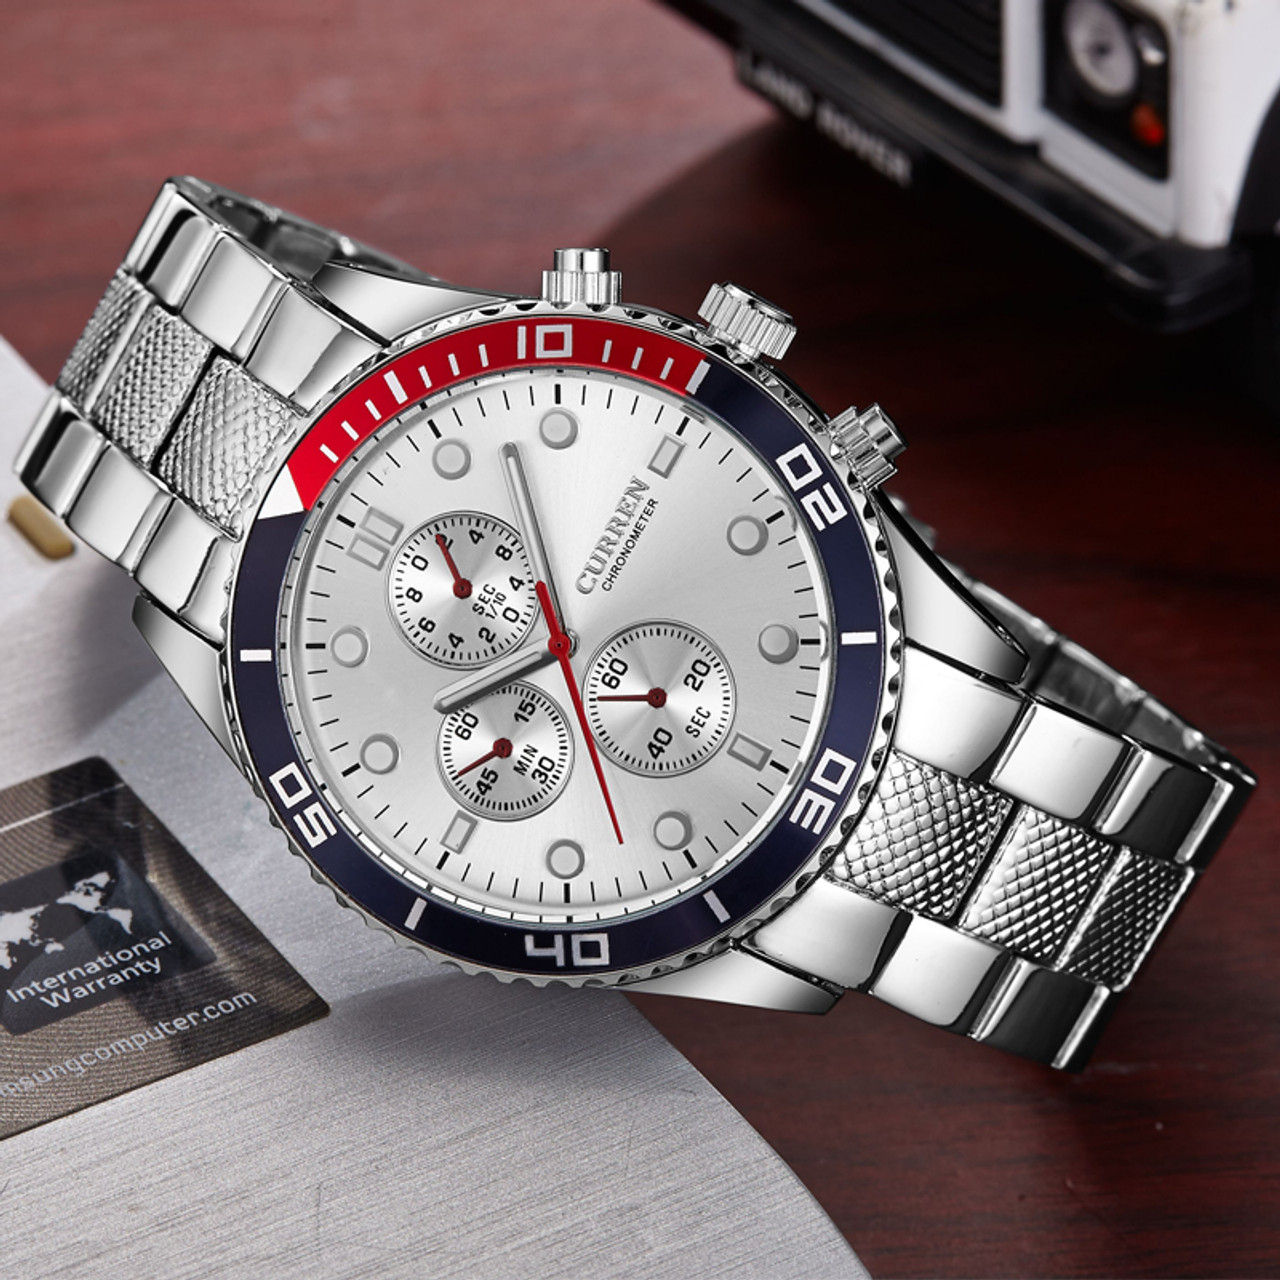 9b10b9f8ed2 Hot Sports Brand Curren Watches Men Luxury Brand Analog Steel Case Men s  Quartz Sports Watches Man Army Military Wrist Watch